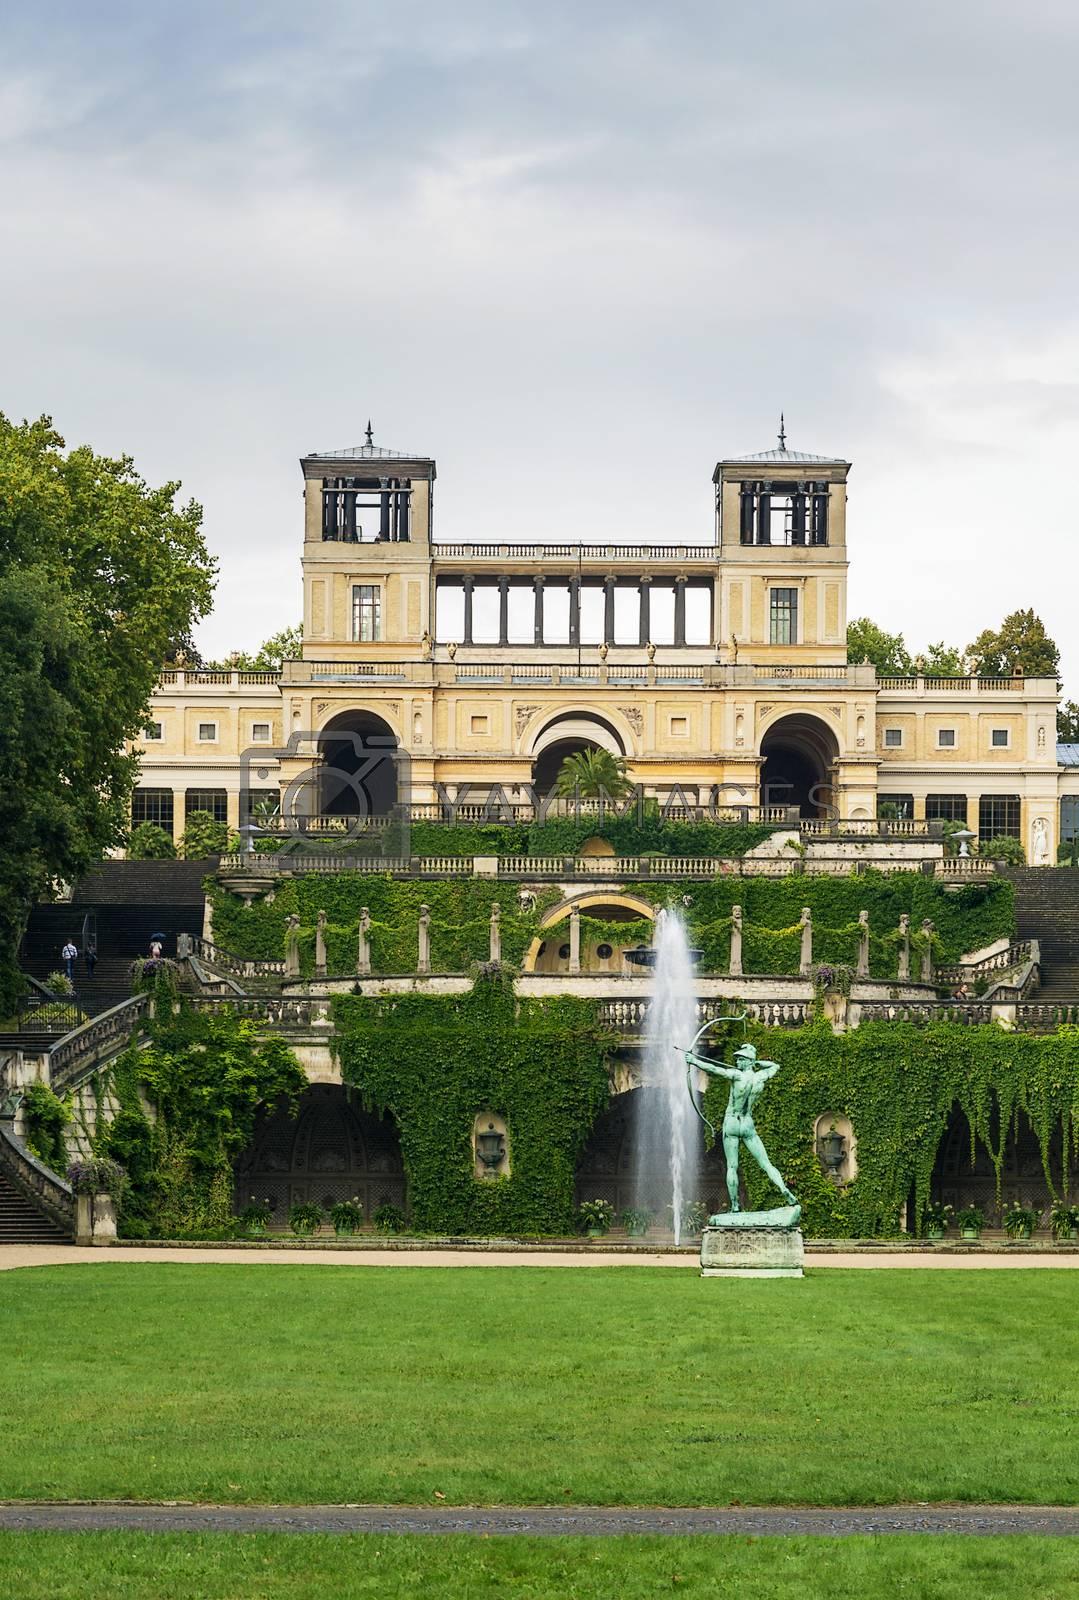 Orangery Palace, Potsdam, Germany by borisb17